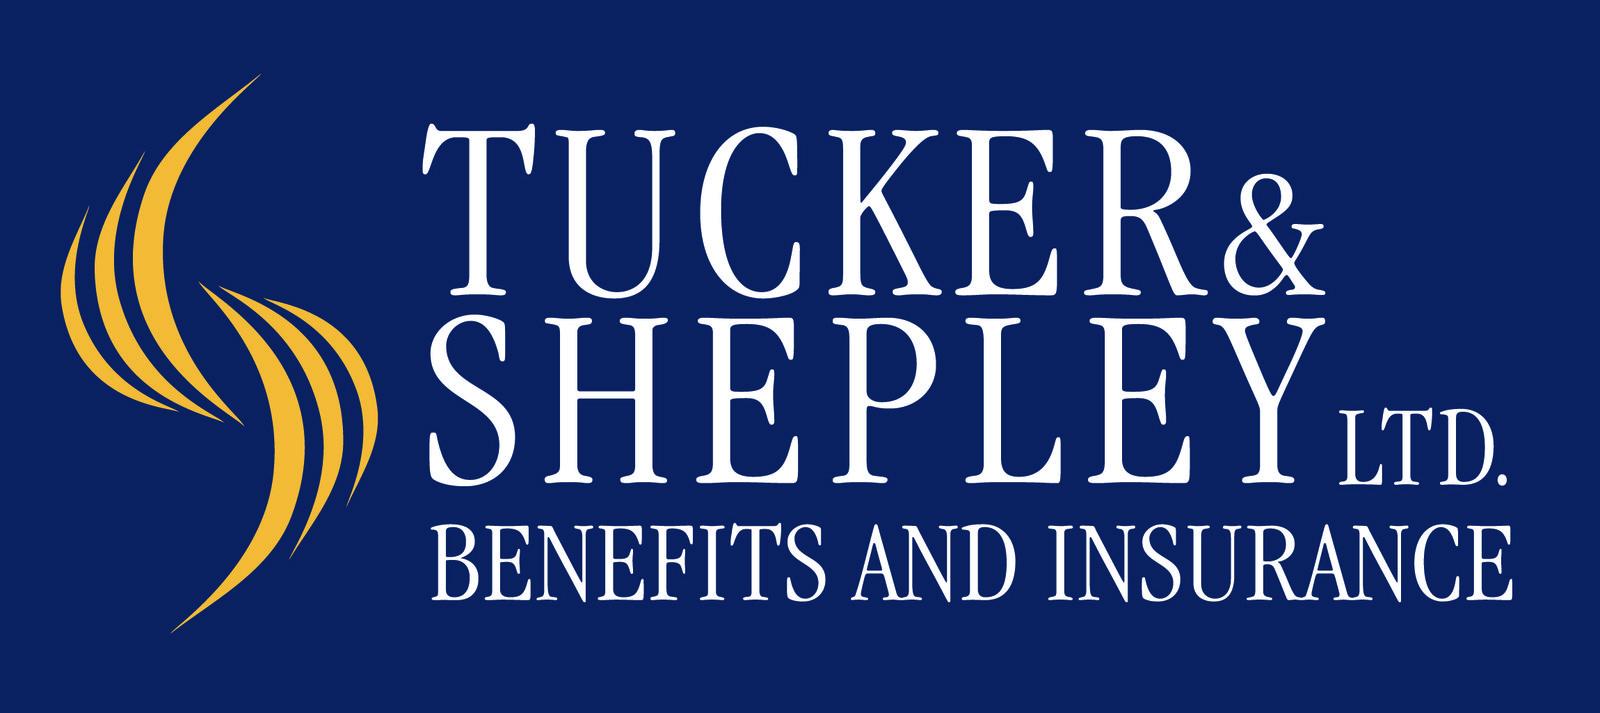 Tucker & Shepley Benefits and Insurance